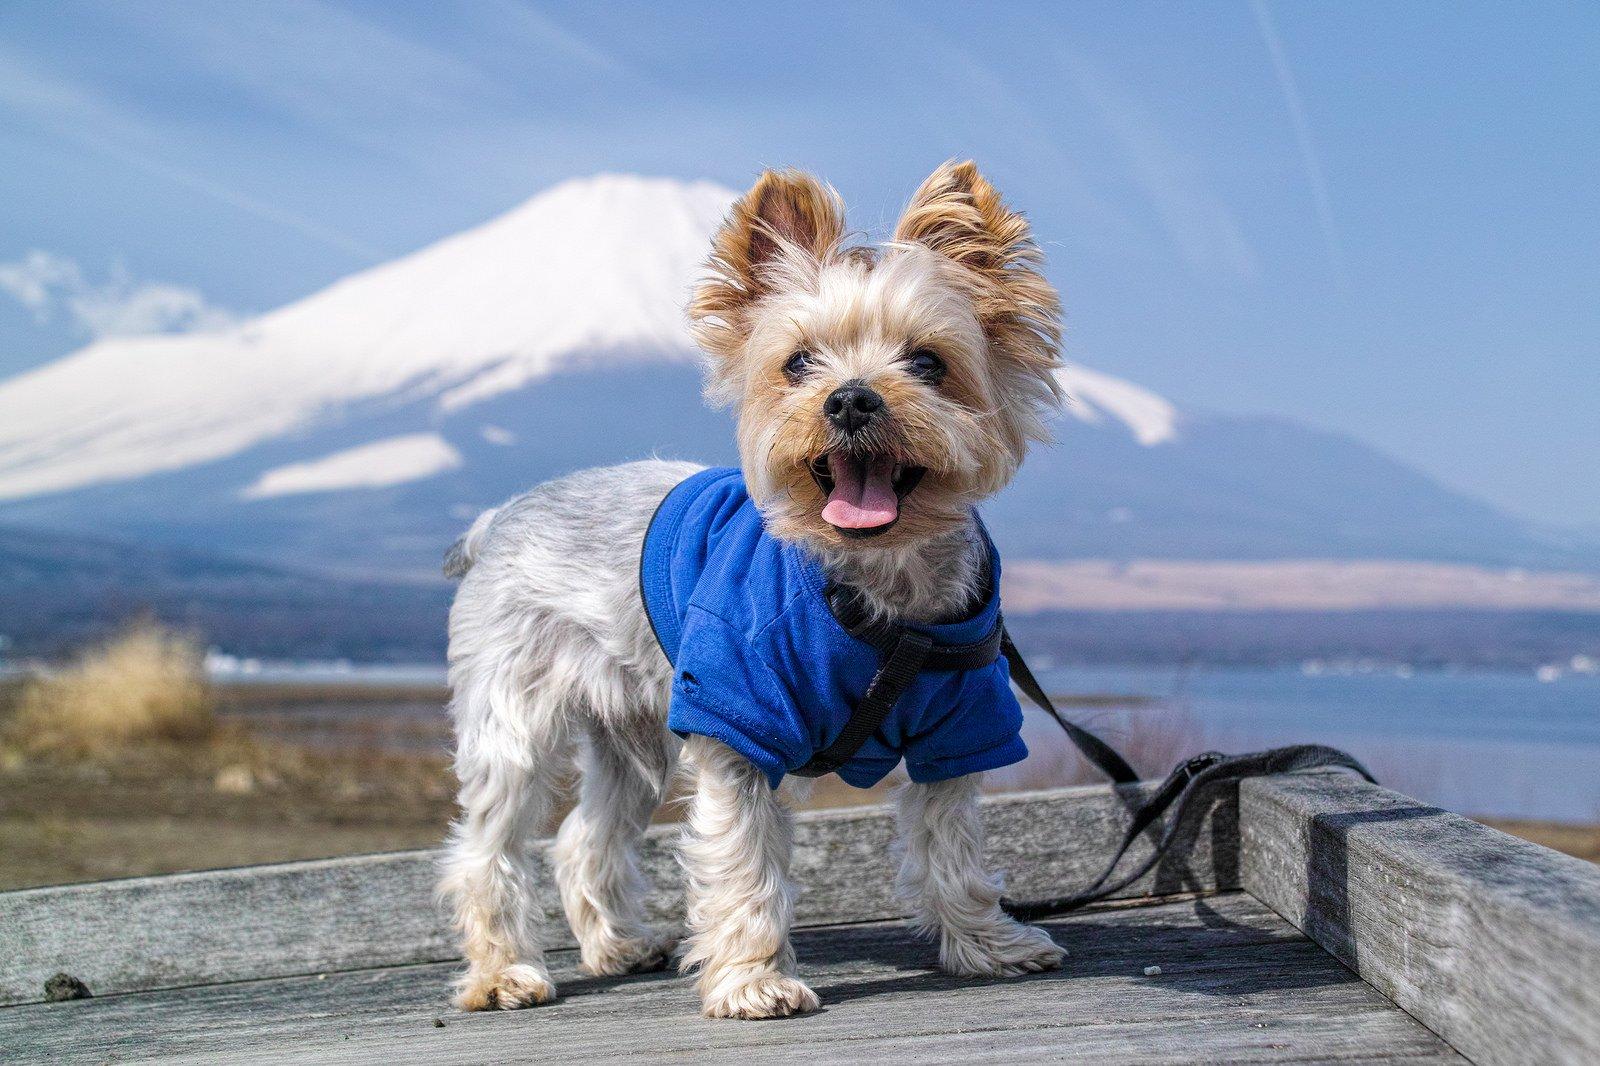 Почему появилась одышка у собаки